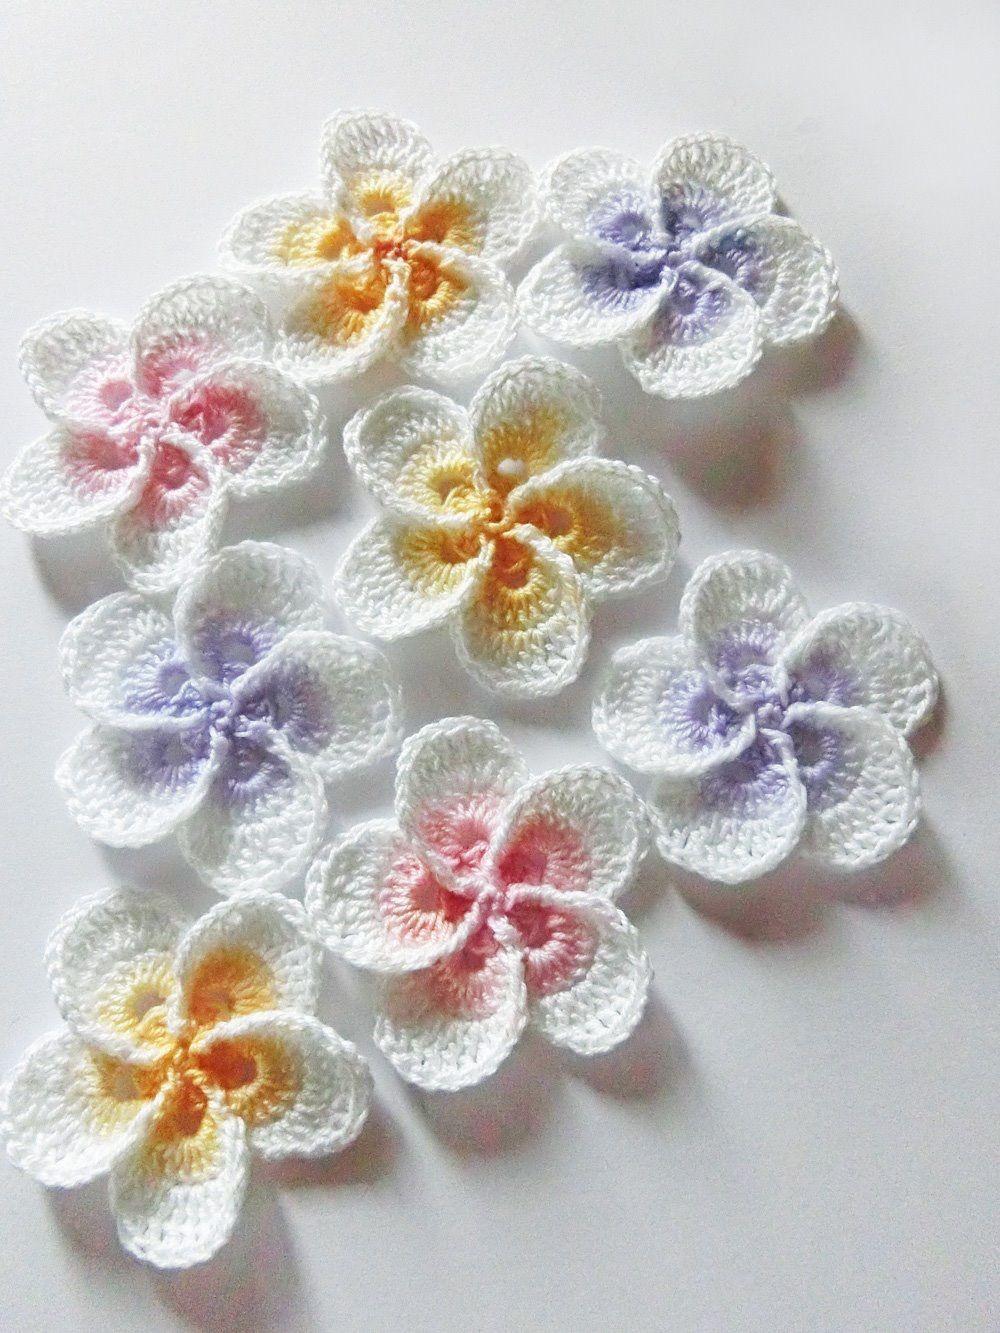 Crochet Plumeria Motif | Ravelry. #crochet #flowers #plumeria ...